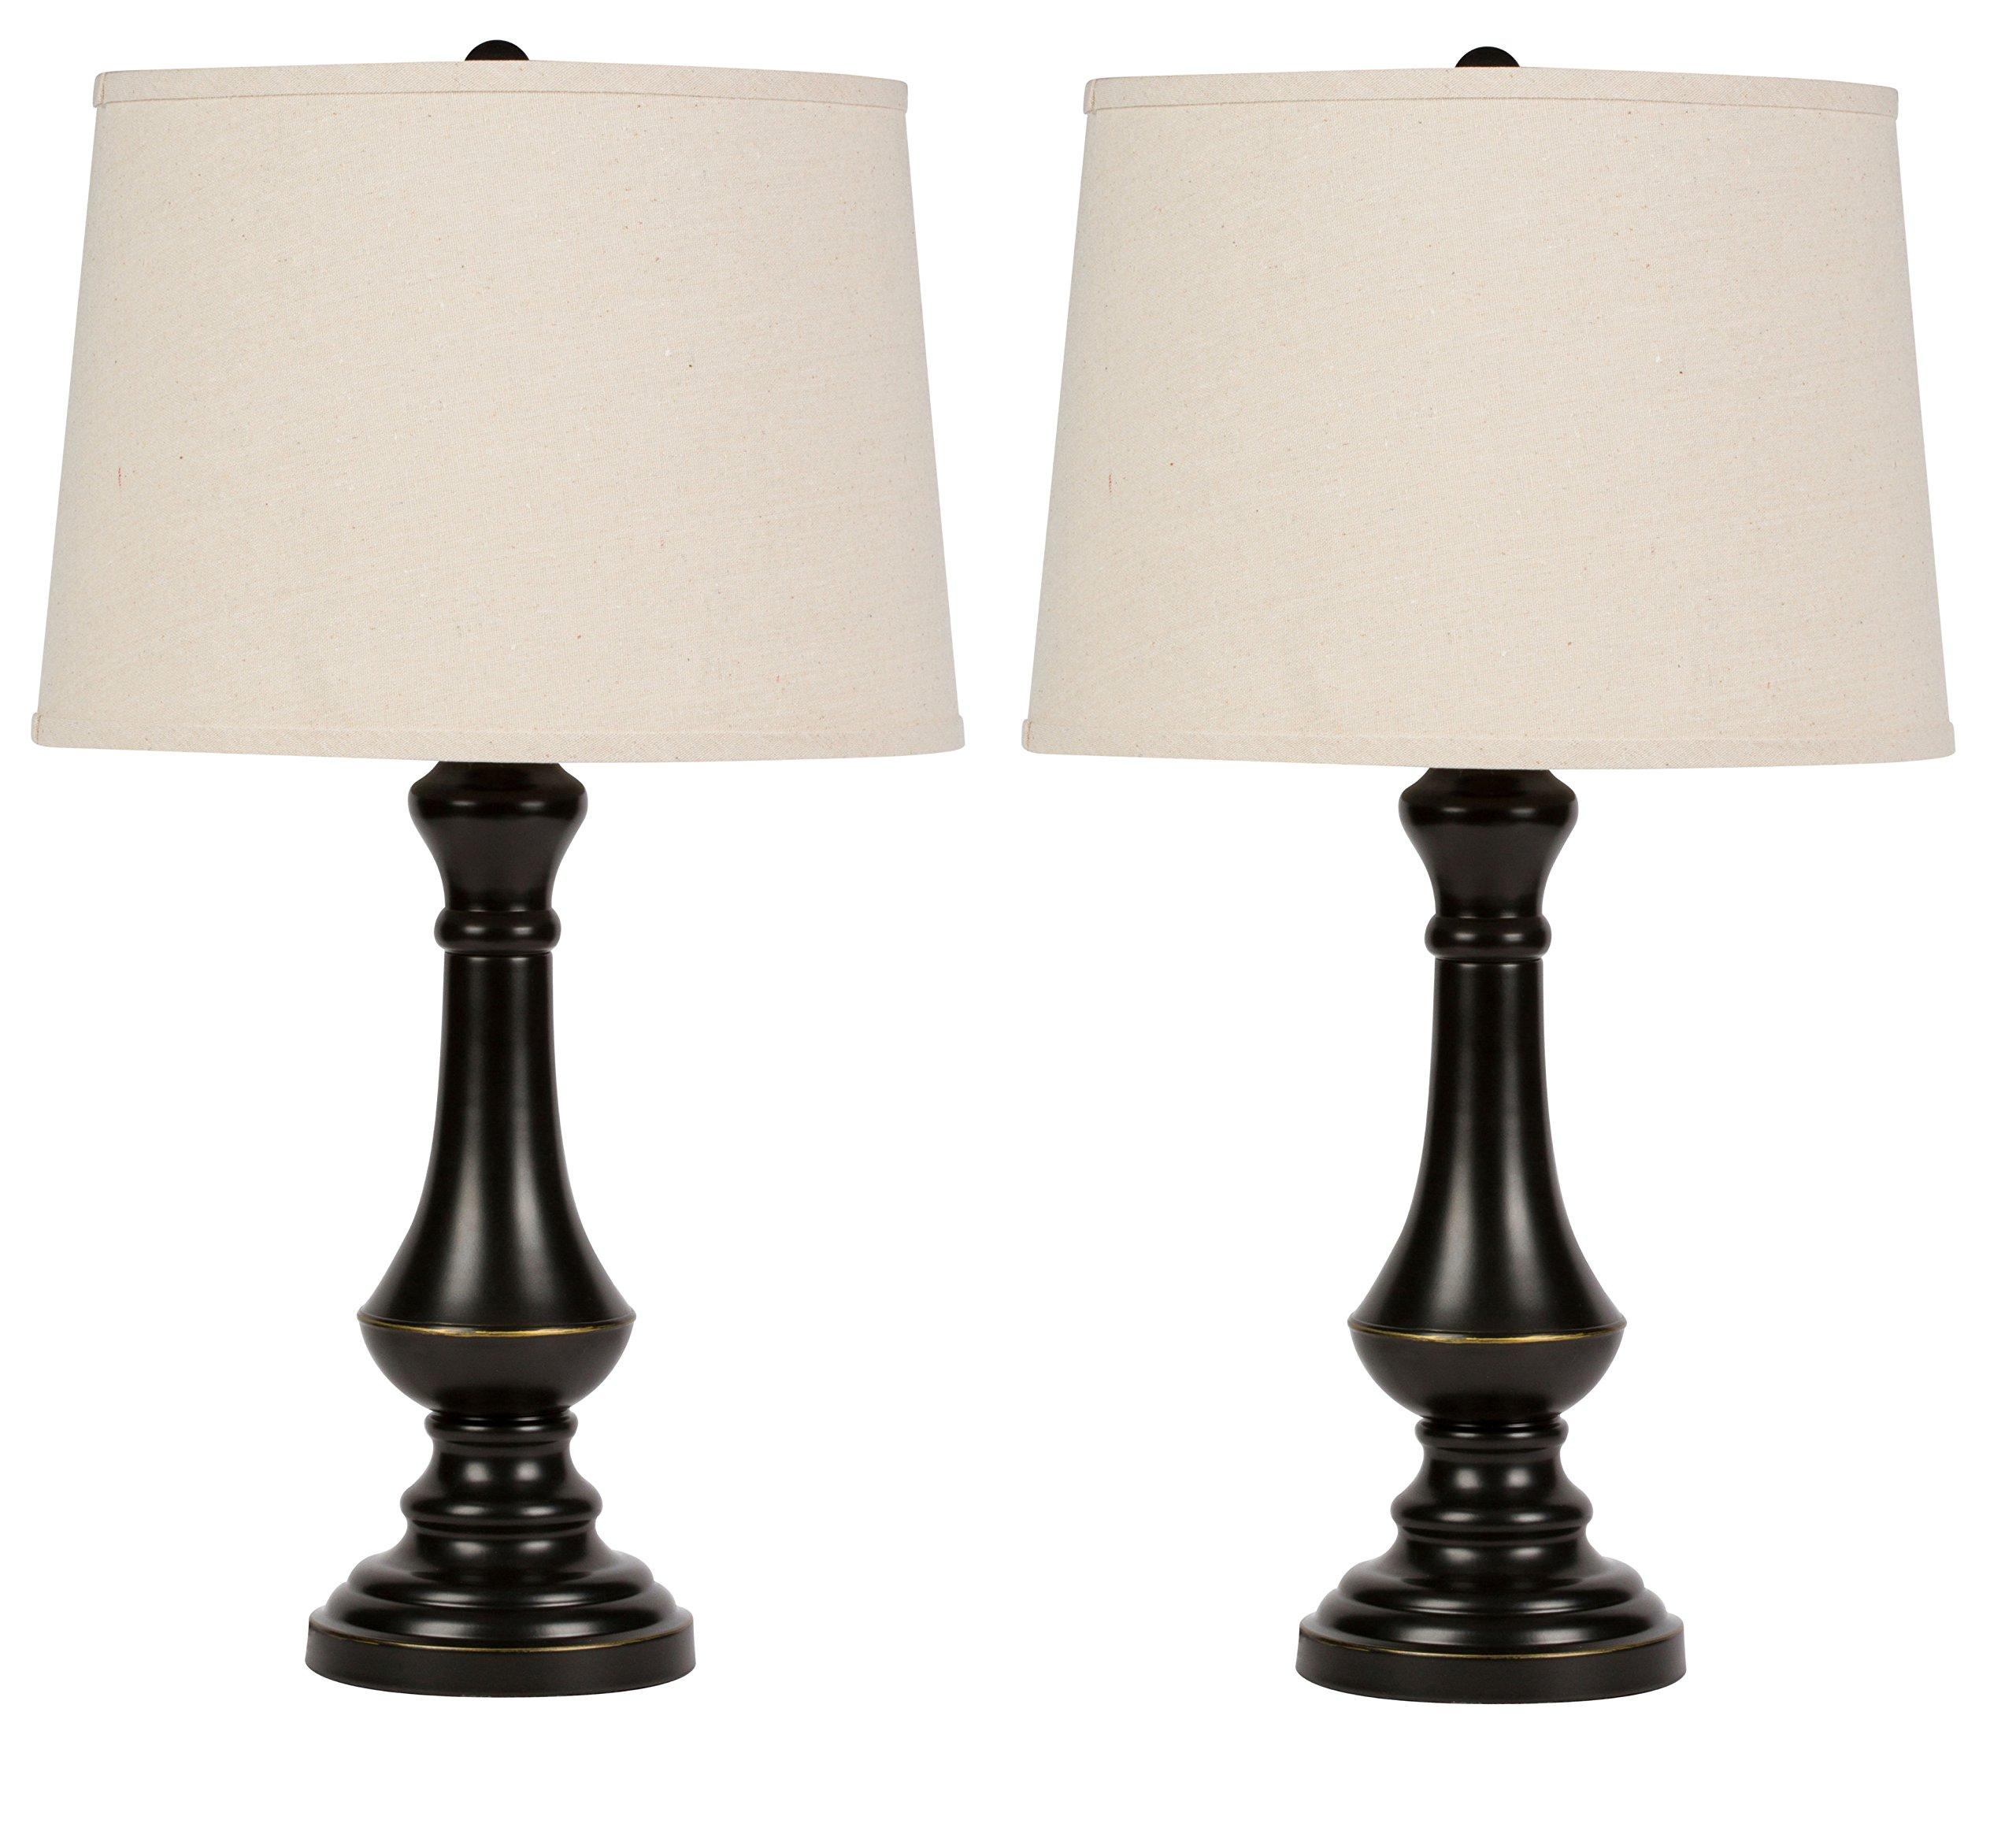 Virtue Home Cambridge Table Lamp Set - 2 Pack